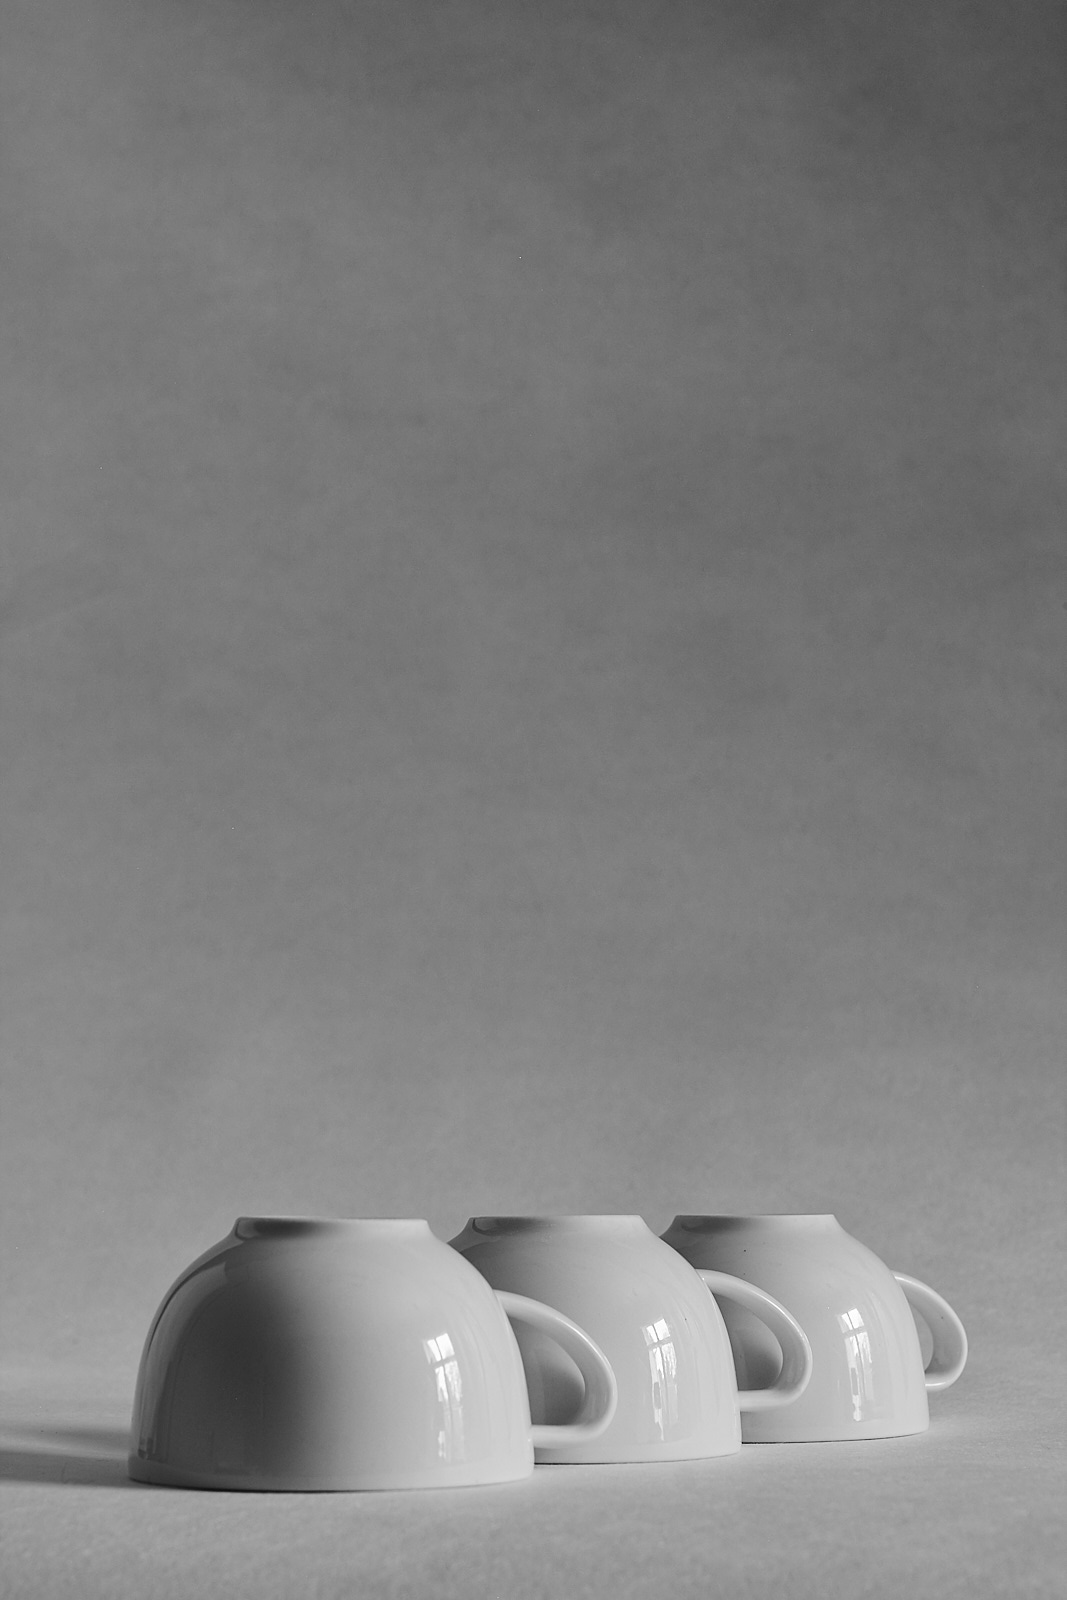 Three Cups0295